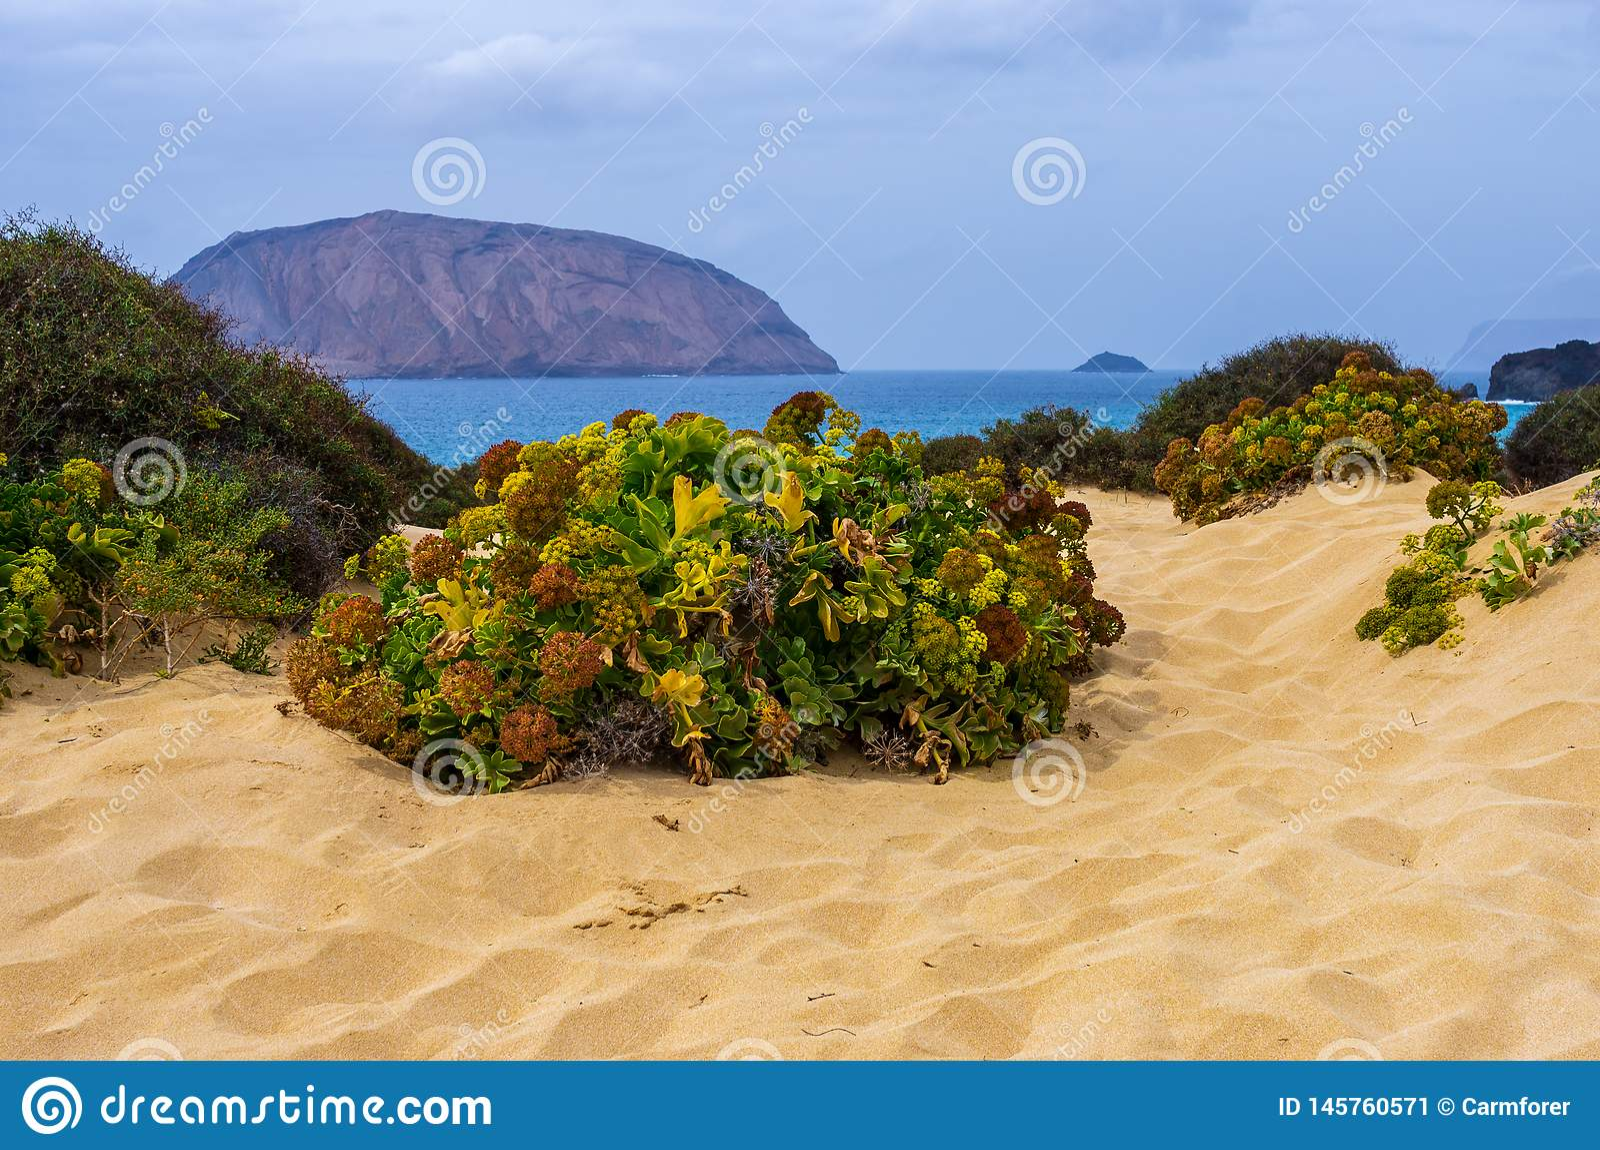 Green desert plant on the beach sand